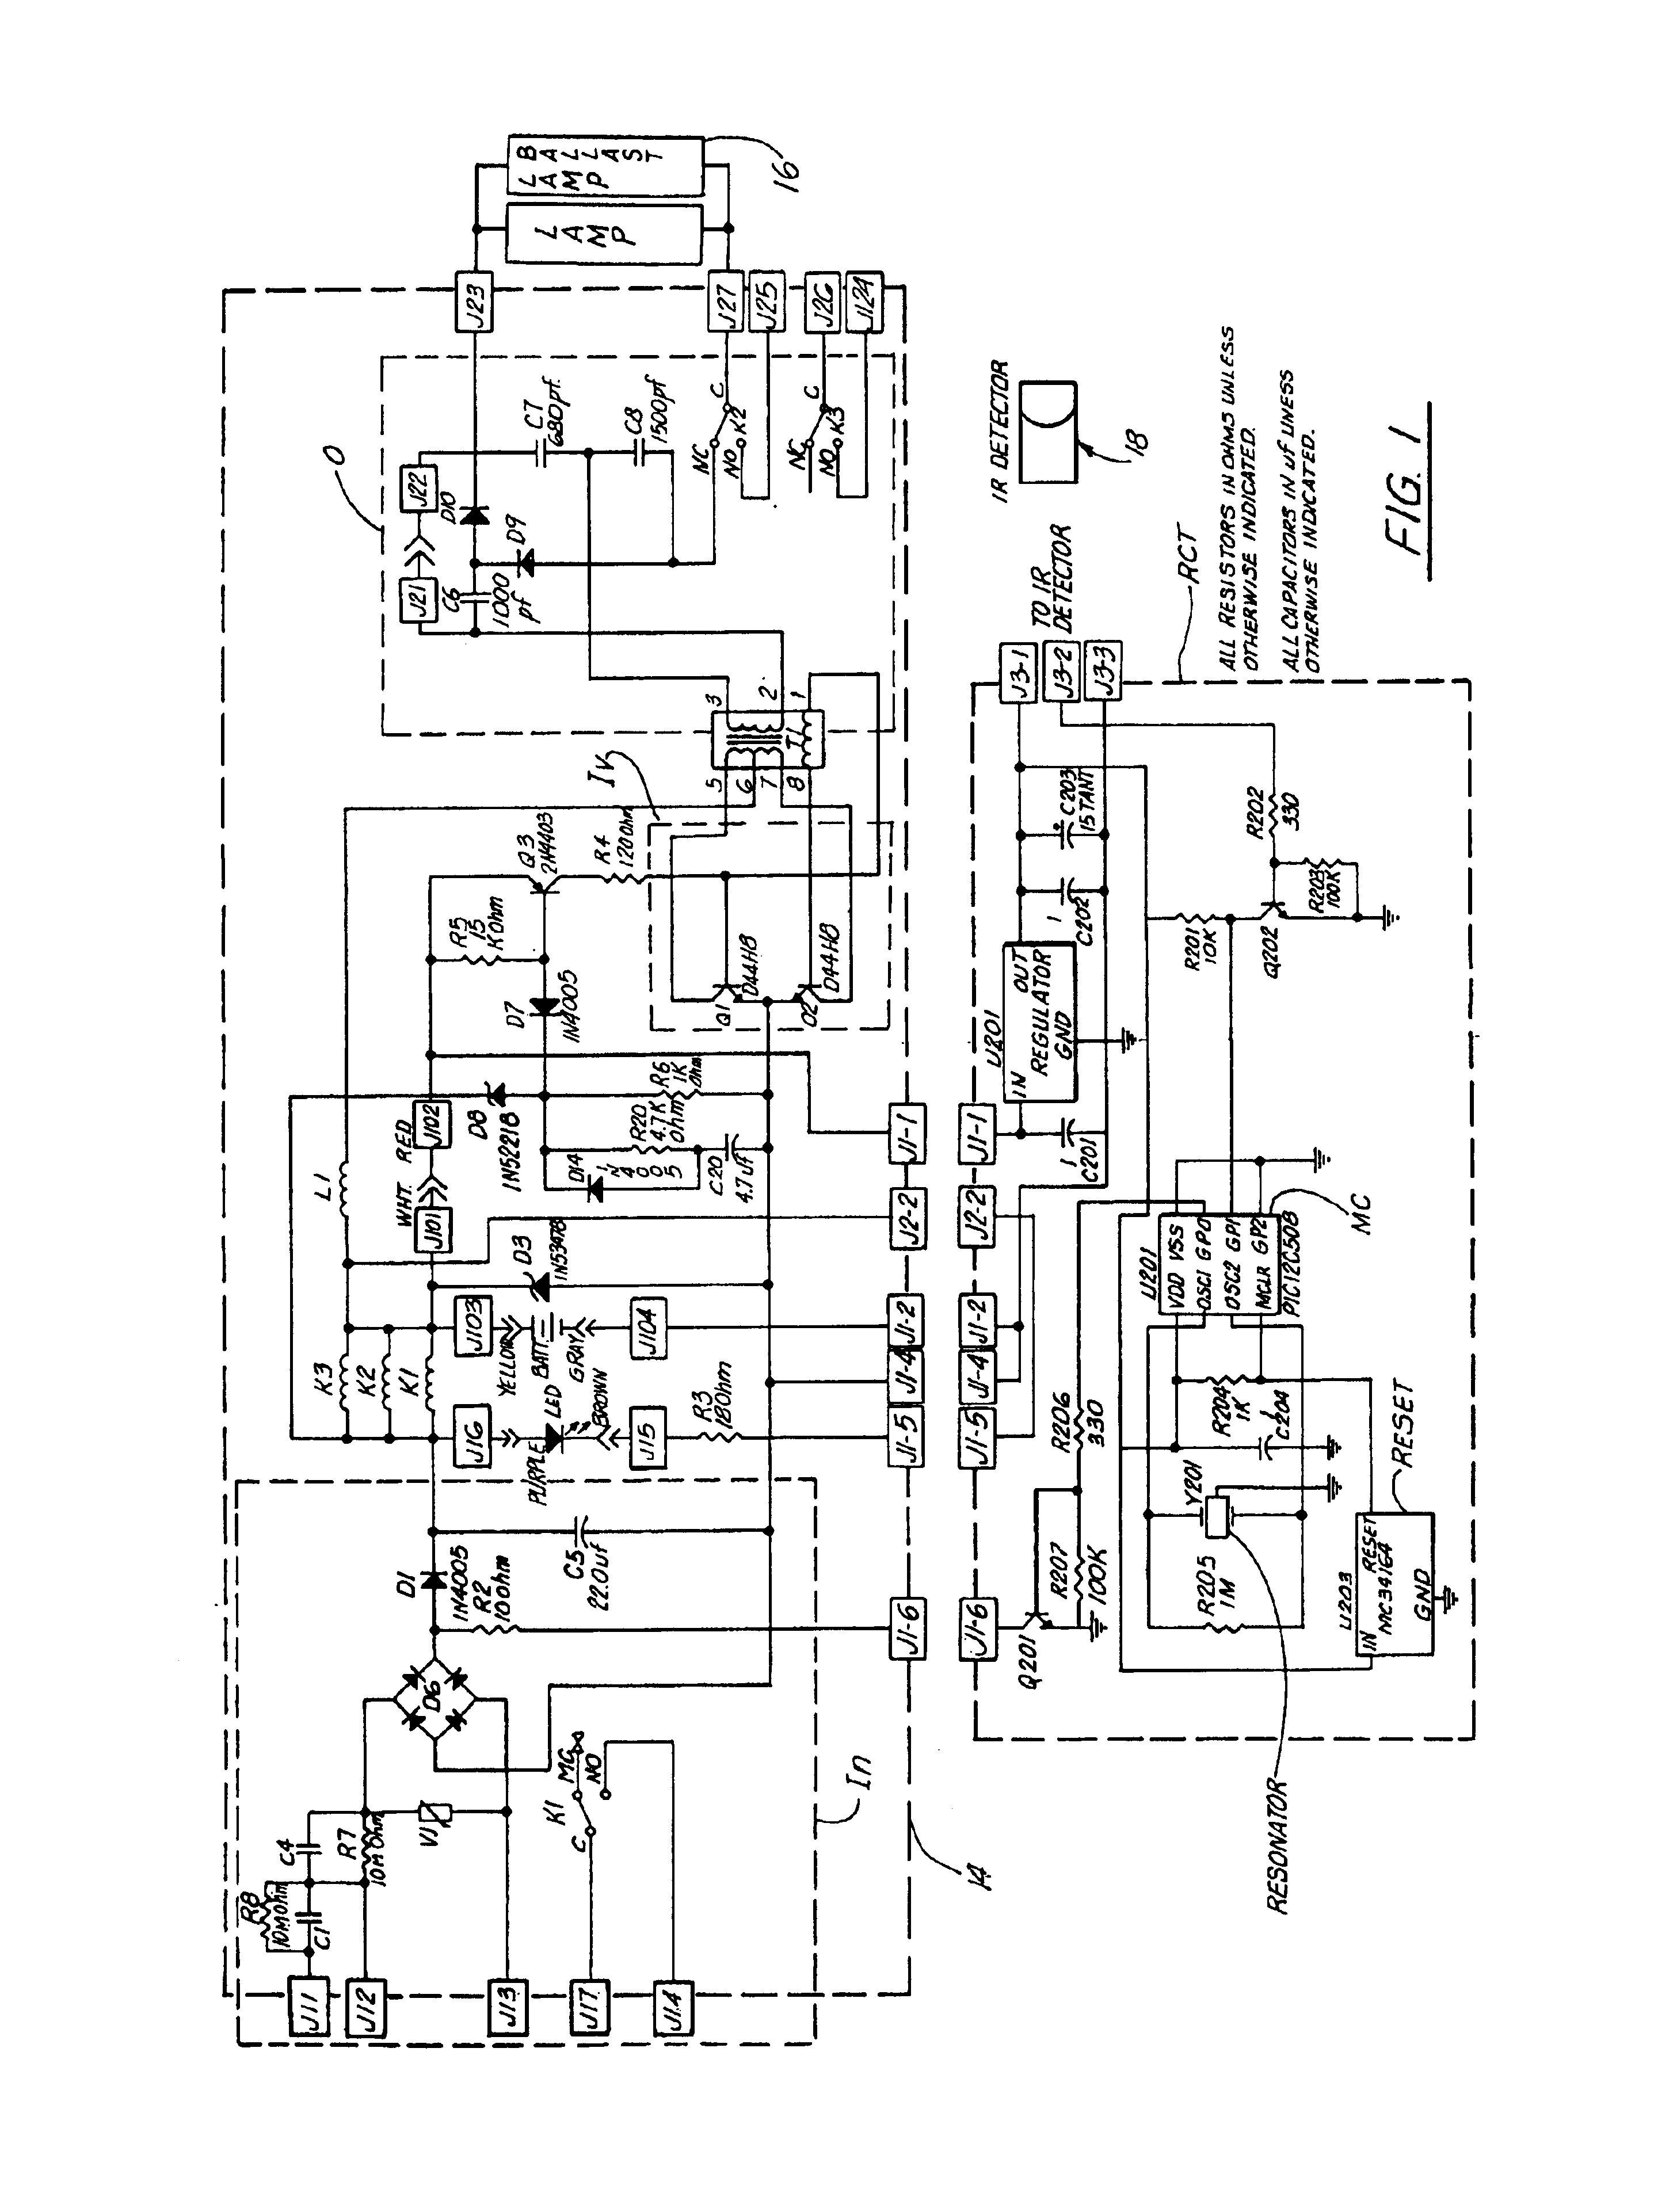 Ballast Wiring Diagram Circuit on led wiring circuit diagram, trailer wiring circuit diagram, circuit breaker diagram,